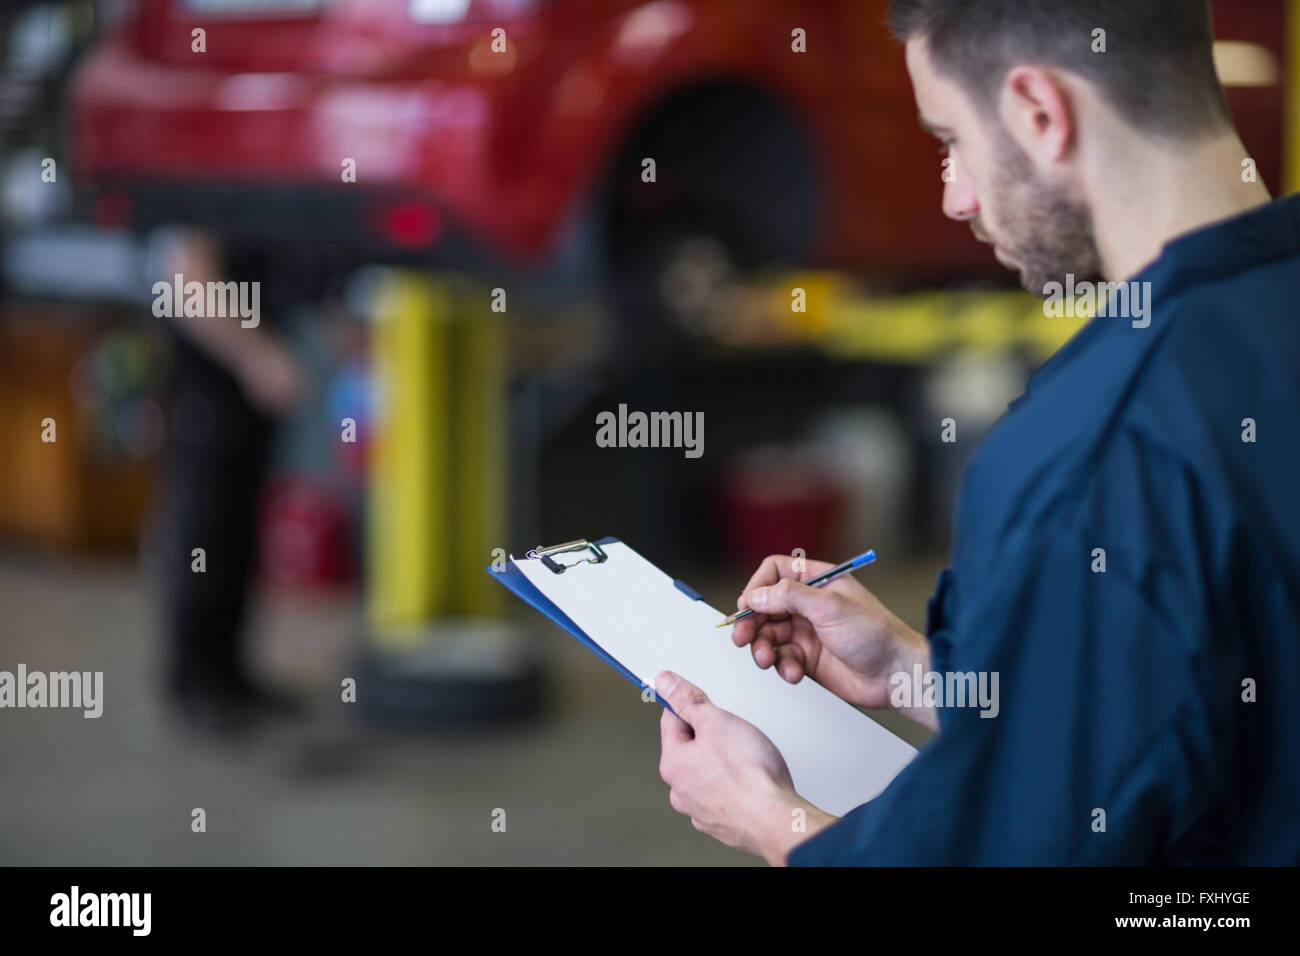 Mechanic preparing a check list - Stock Image